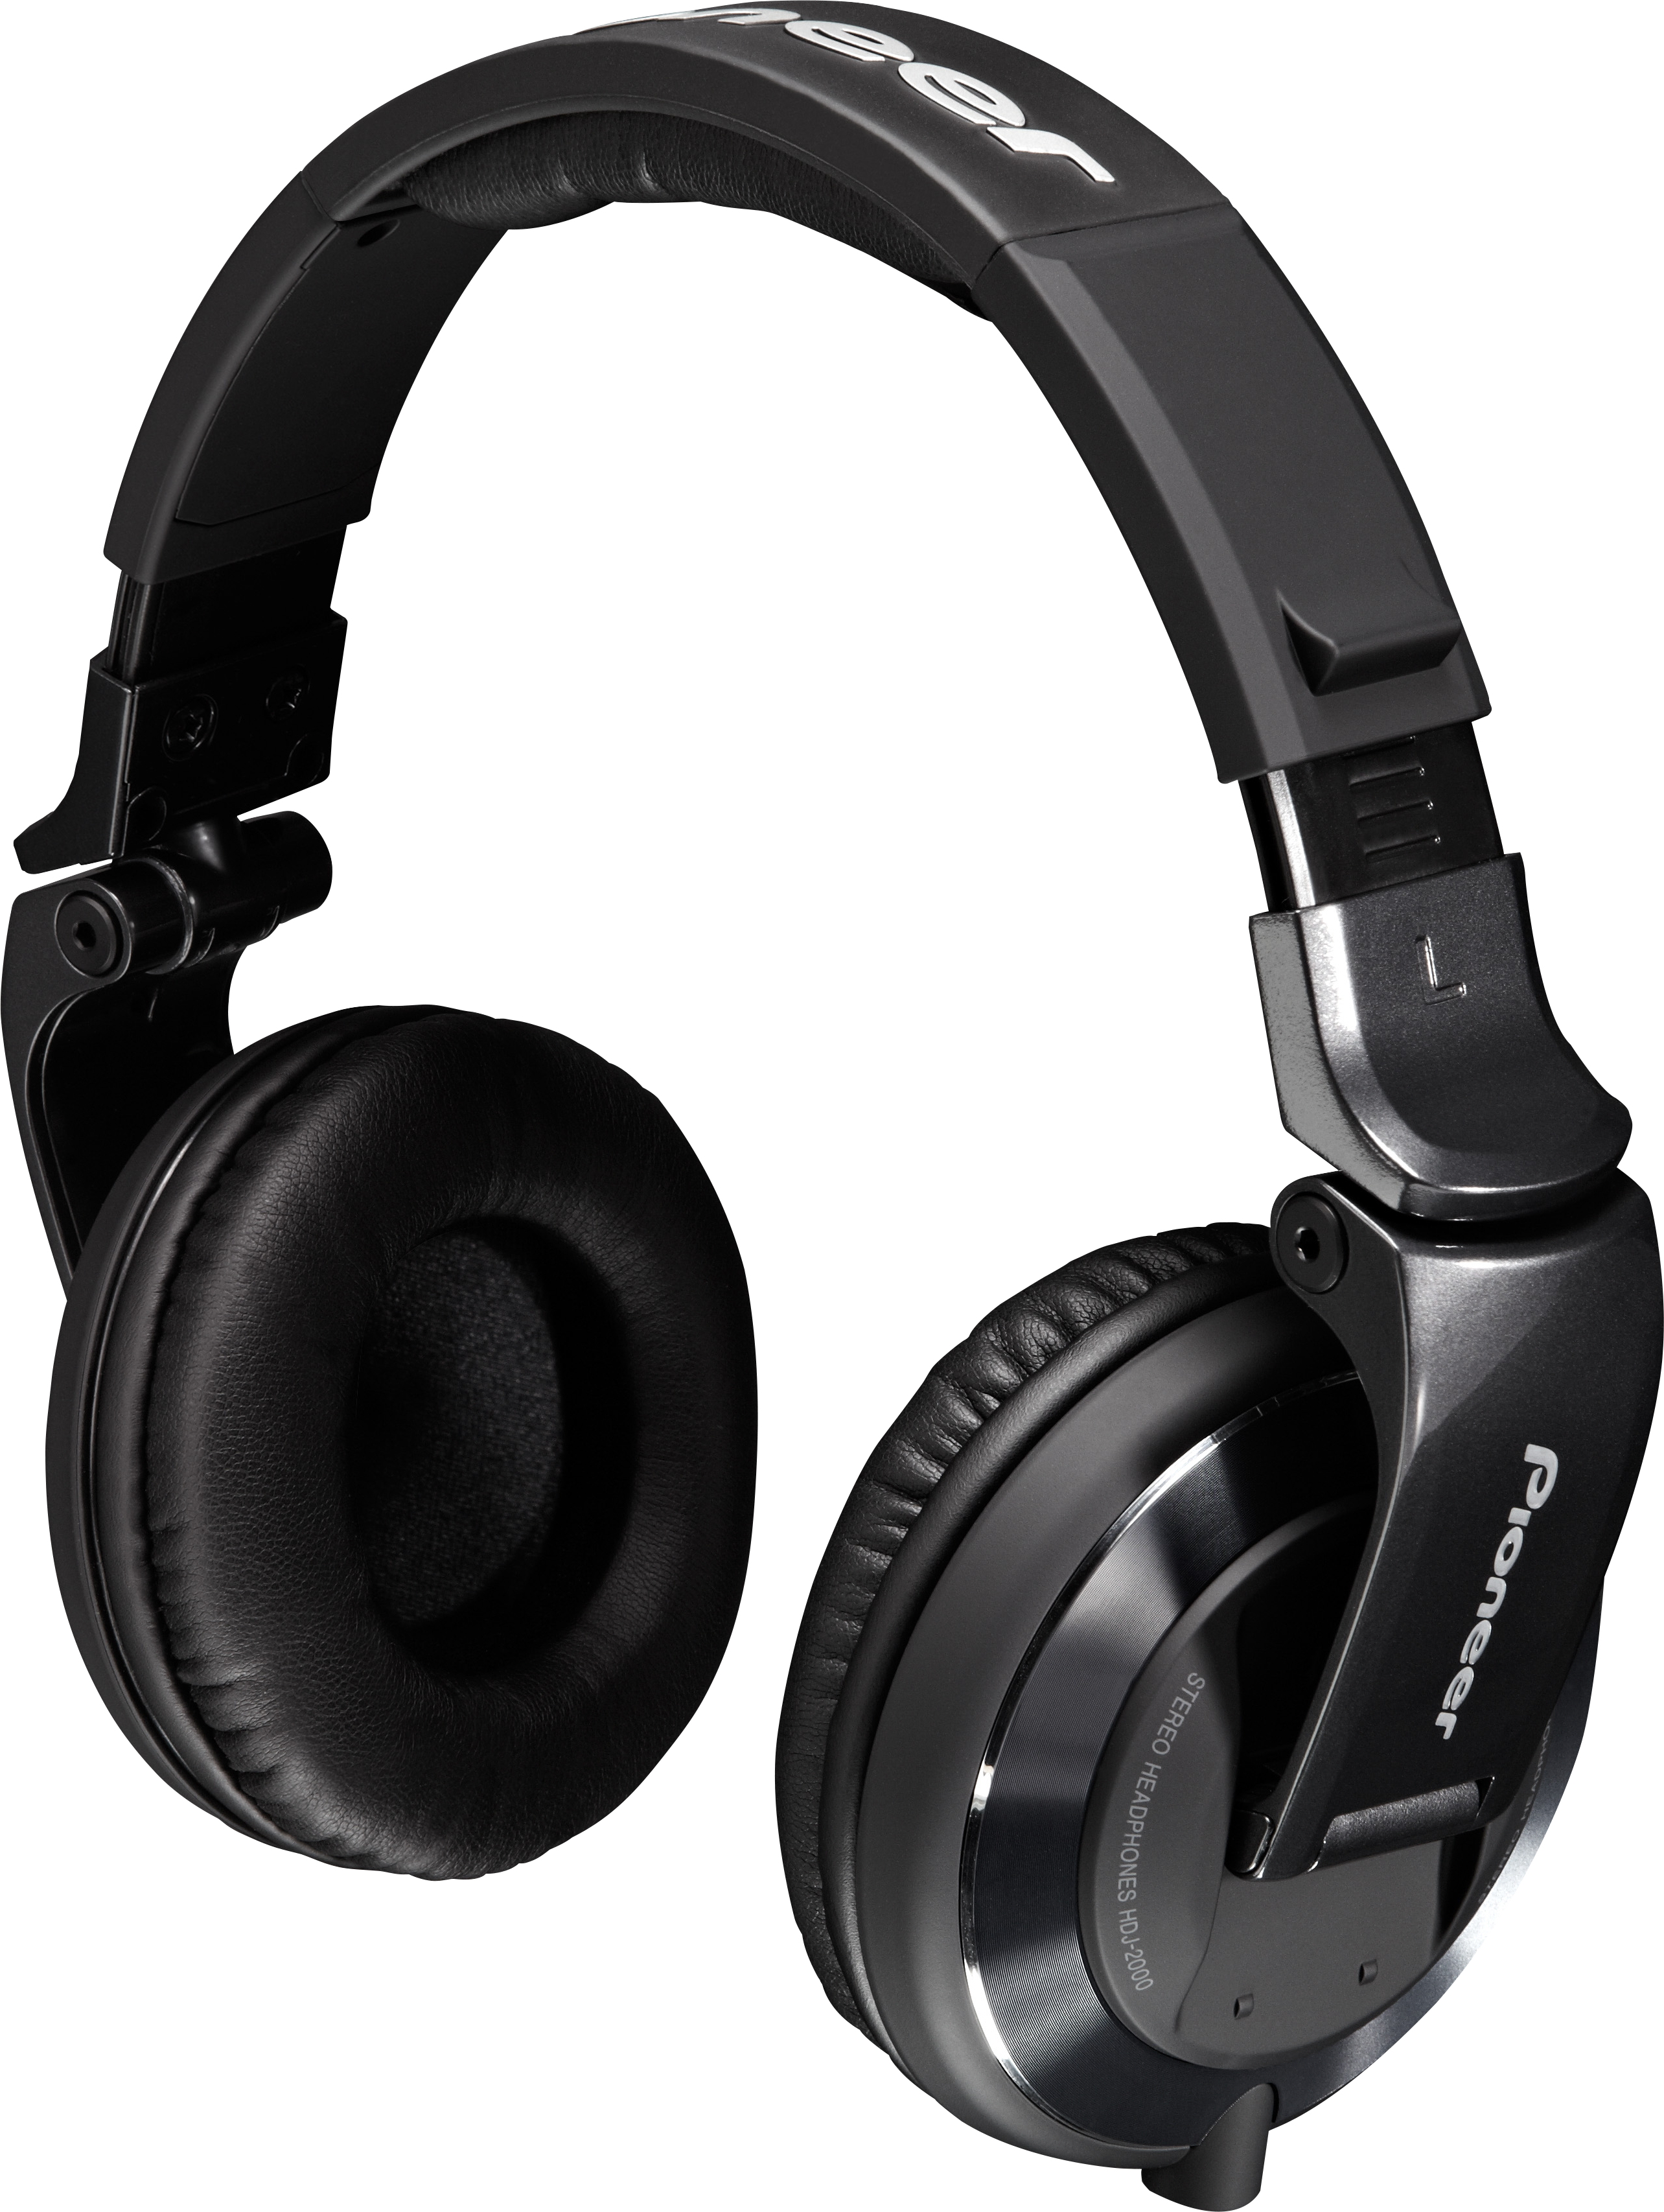 HD Professional Dj Headphones.